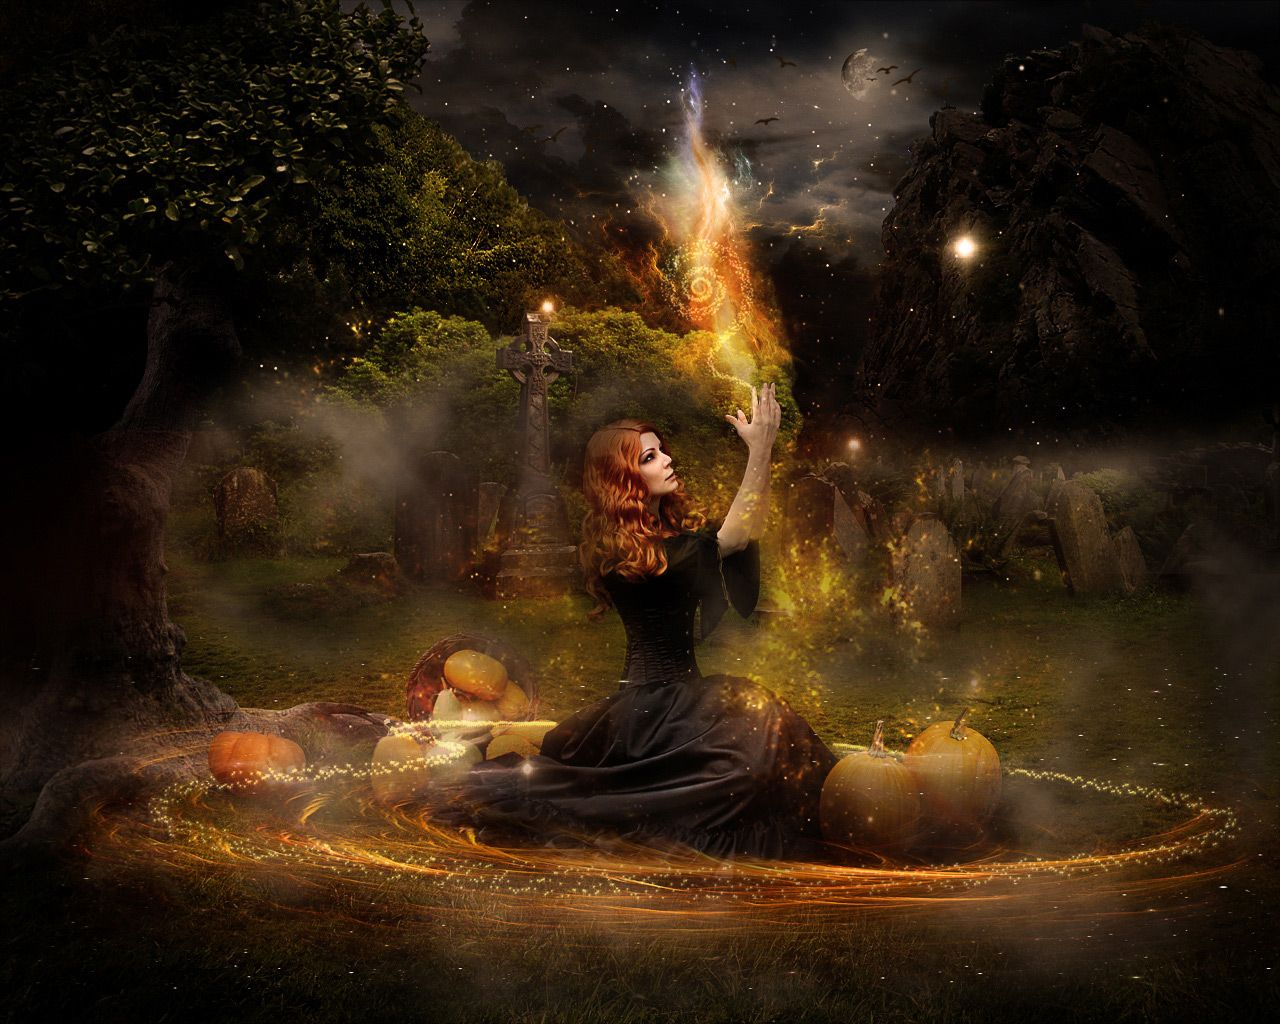 Witchcraft threatens spread of the Gospel.